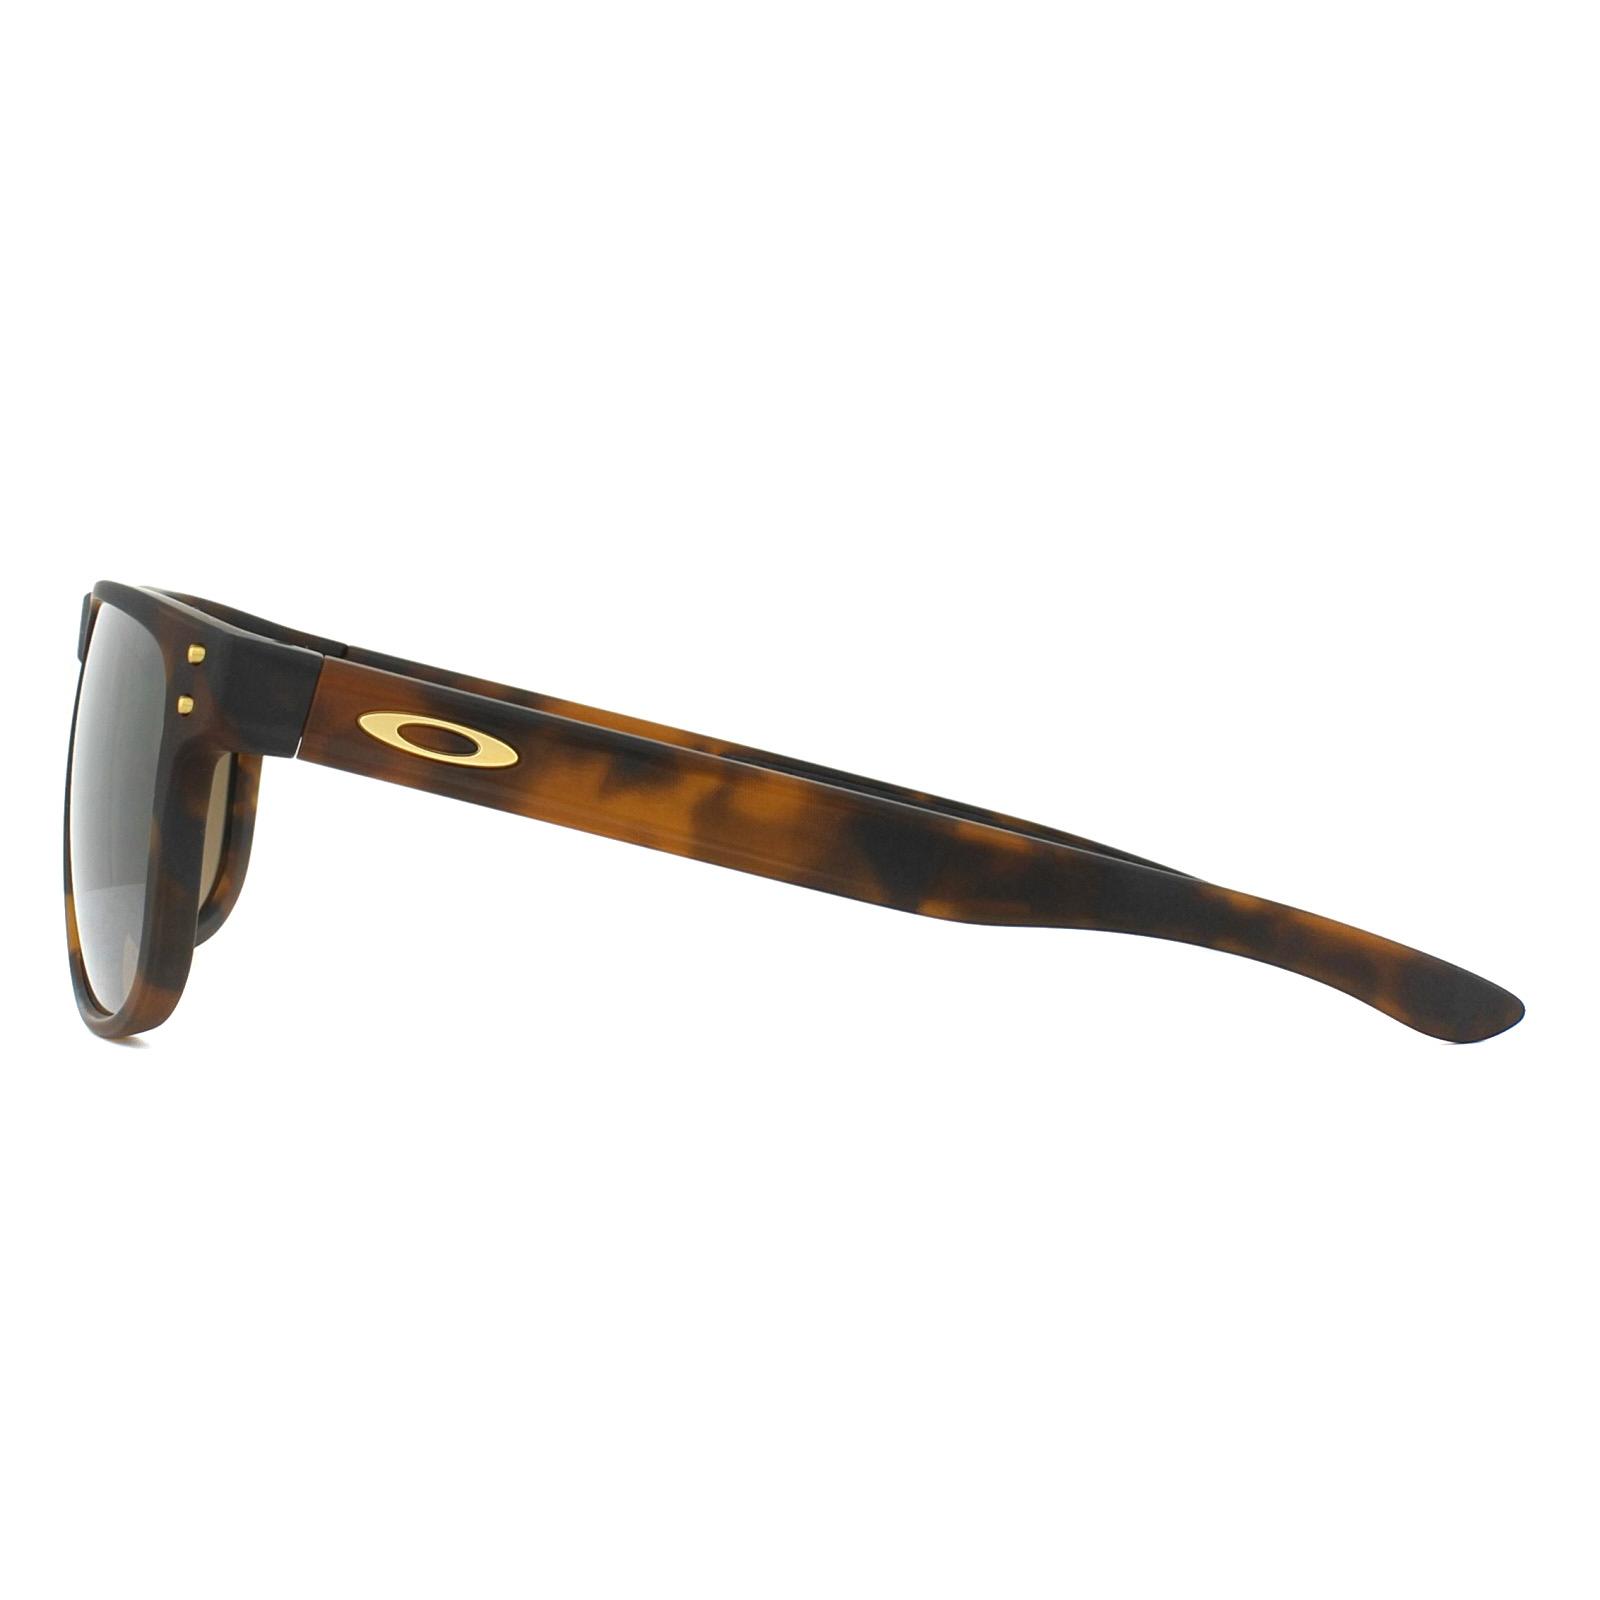 55f014197c Sentinel Oakley Sunglasses Holbrook R OO9377-06 Dark Tortoise Prizm  Tungsten Polarized